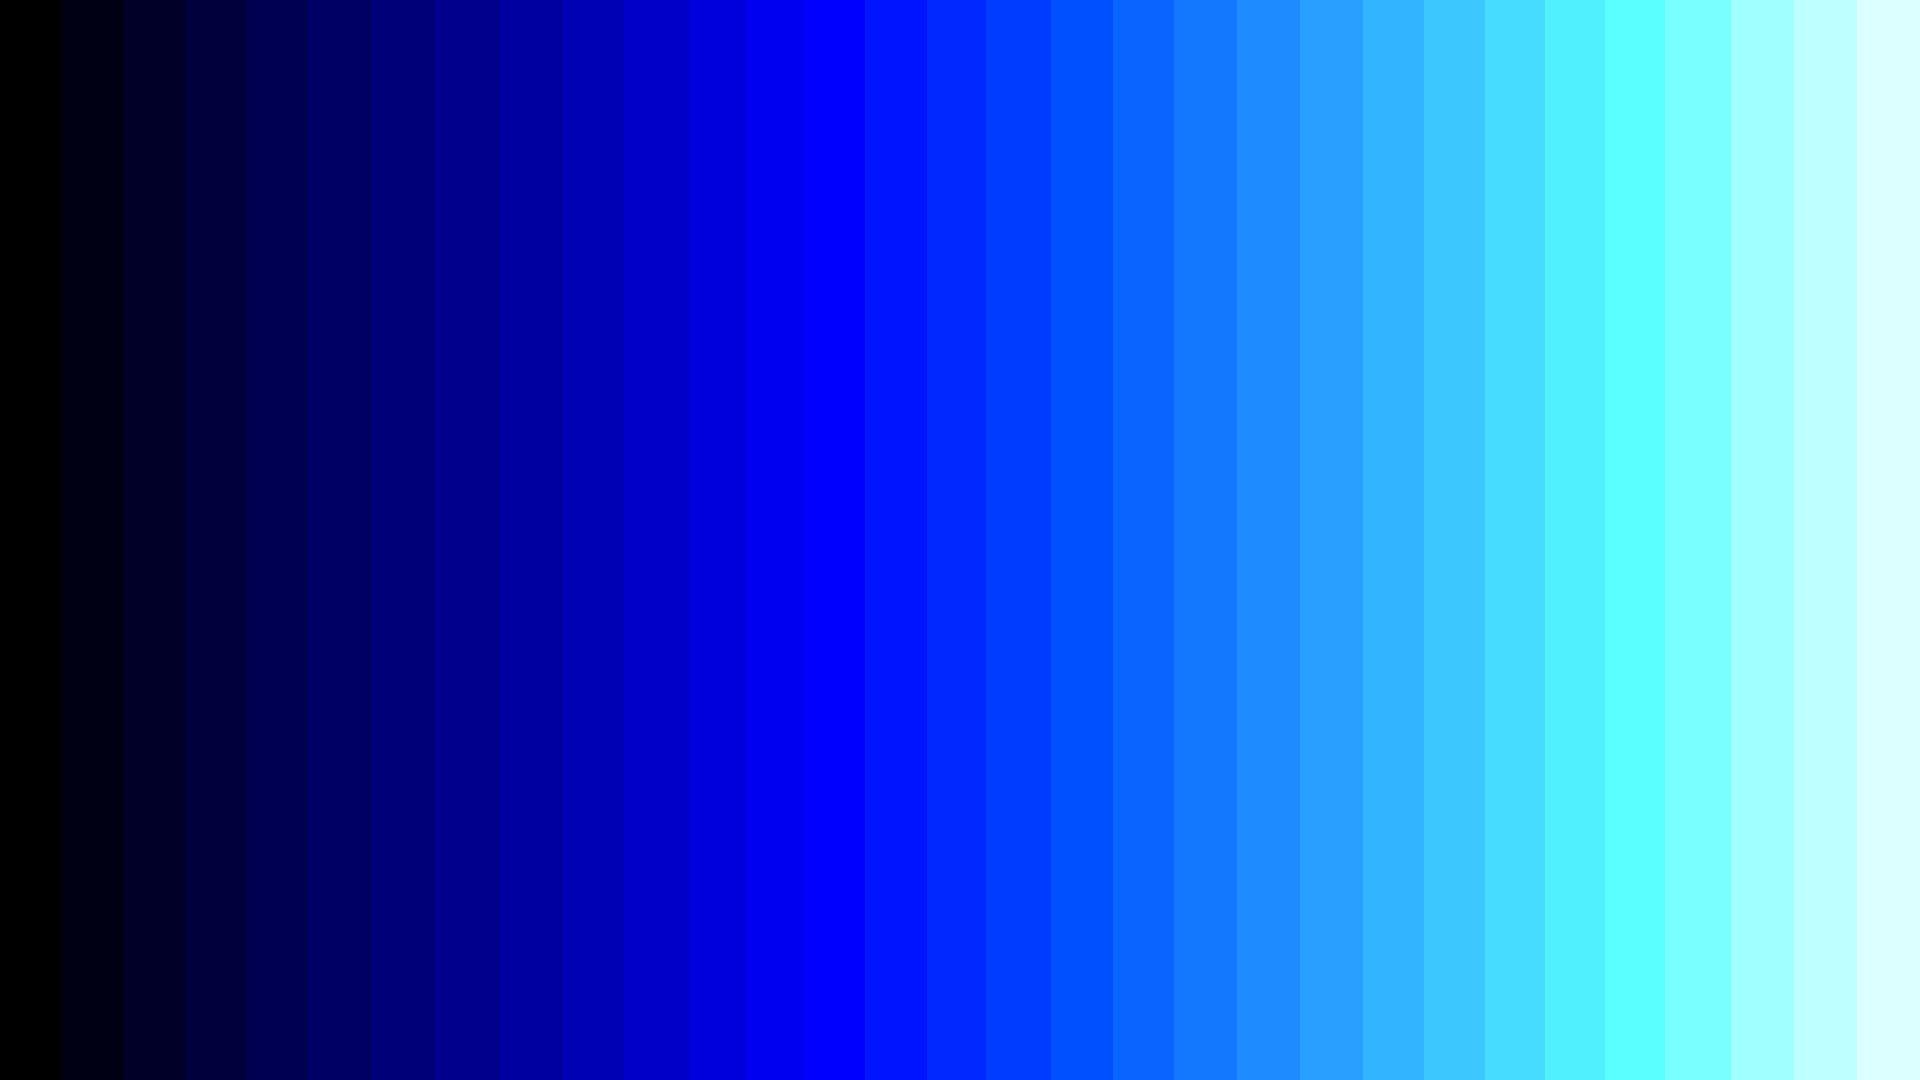 blue gradiant